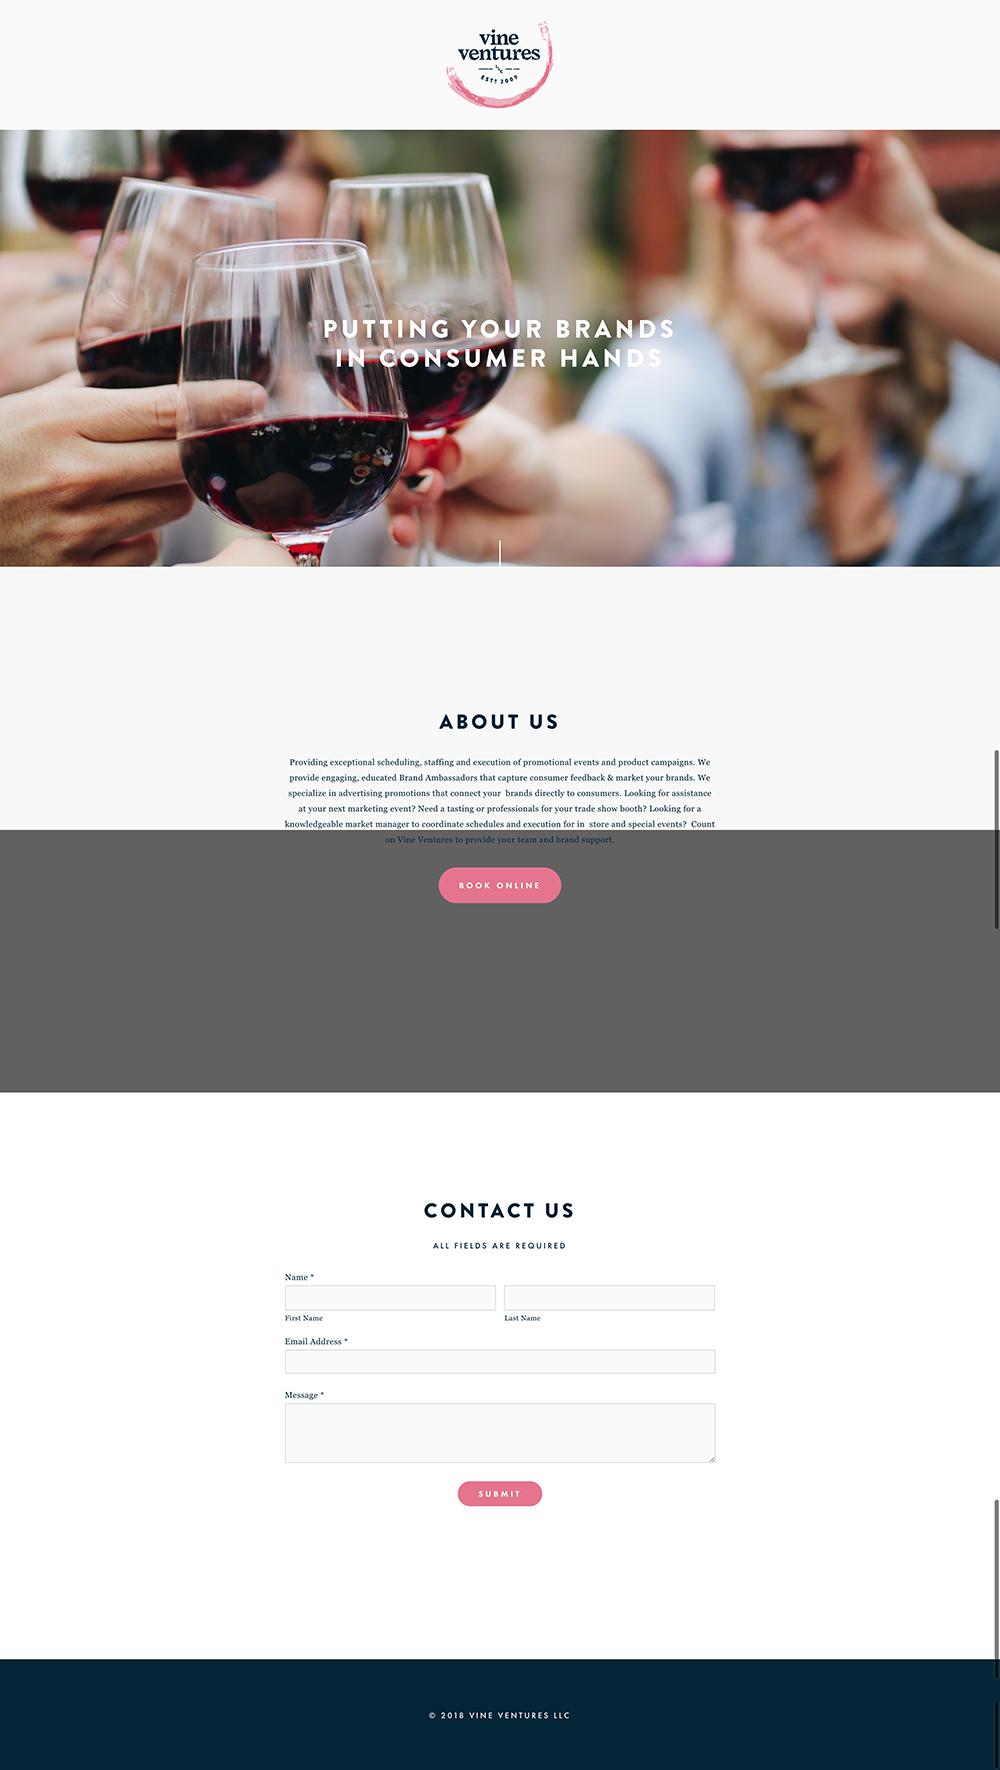 Vine Ventures marketing website